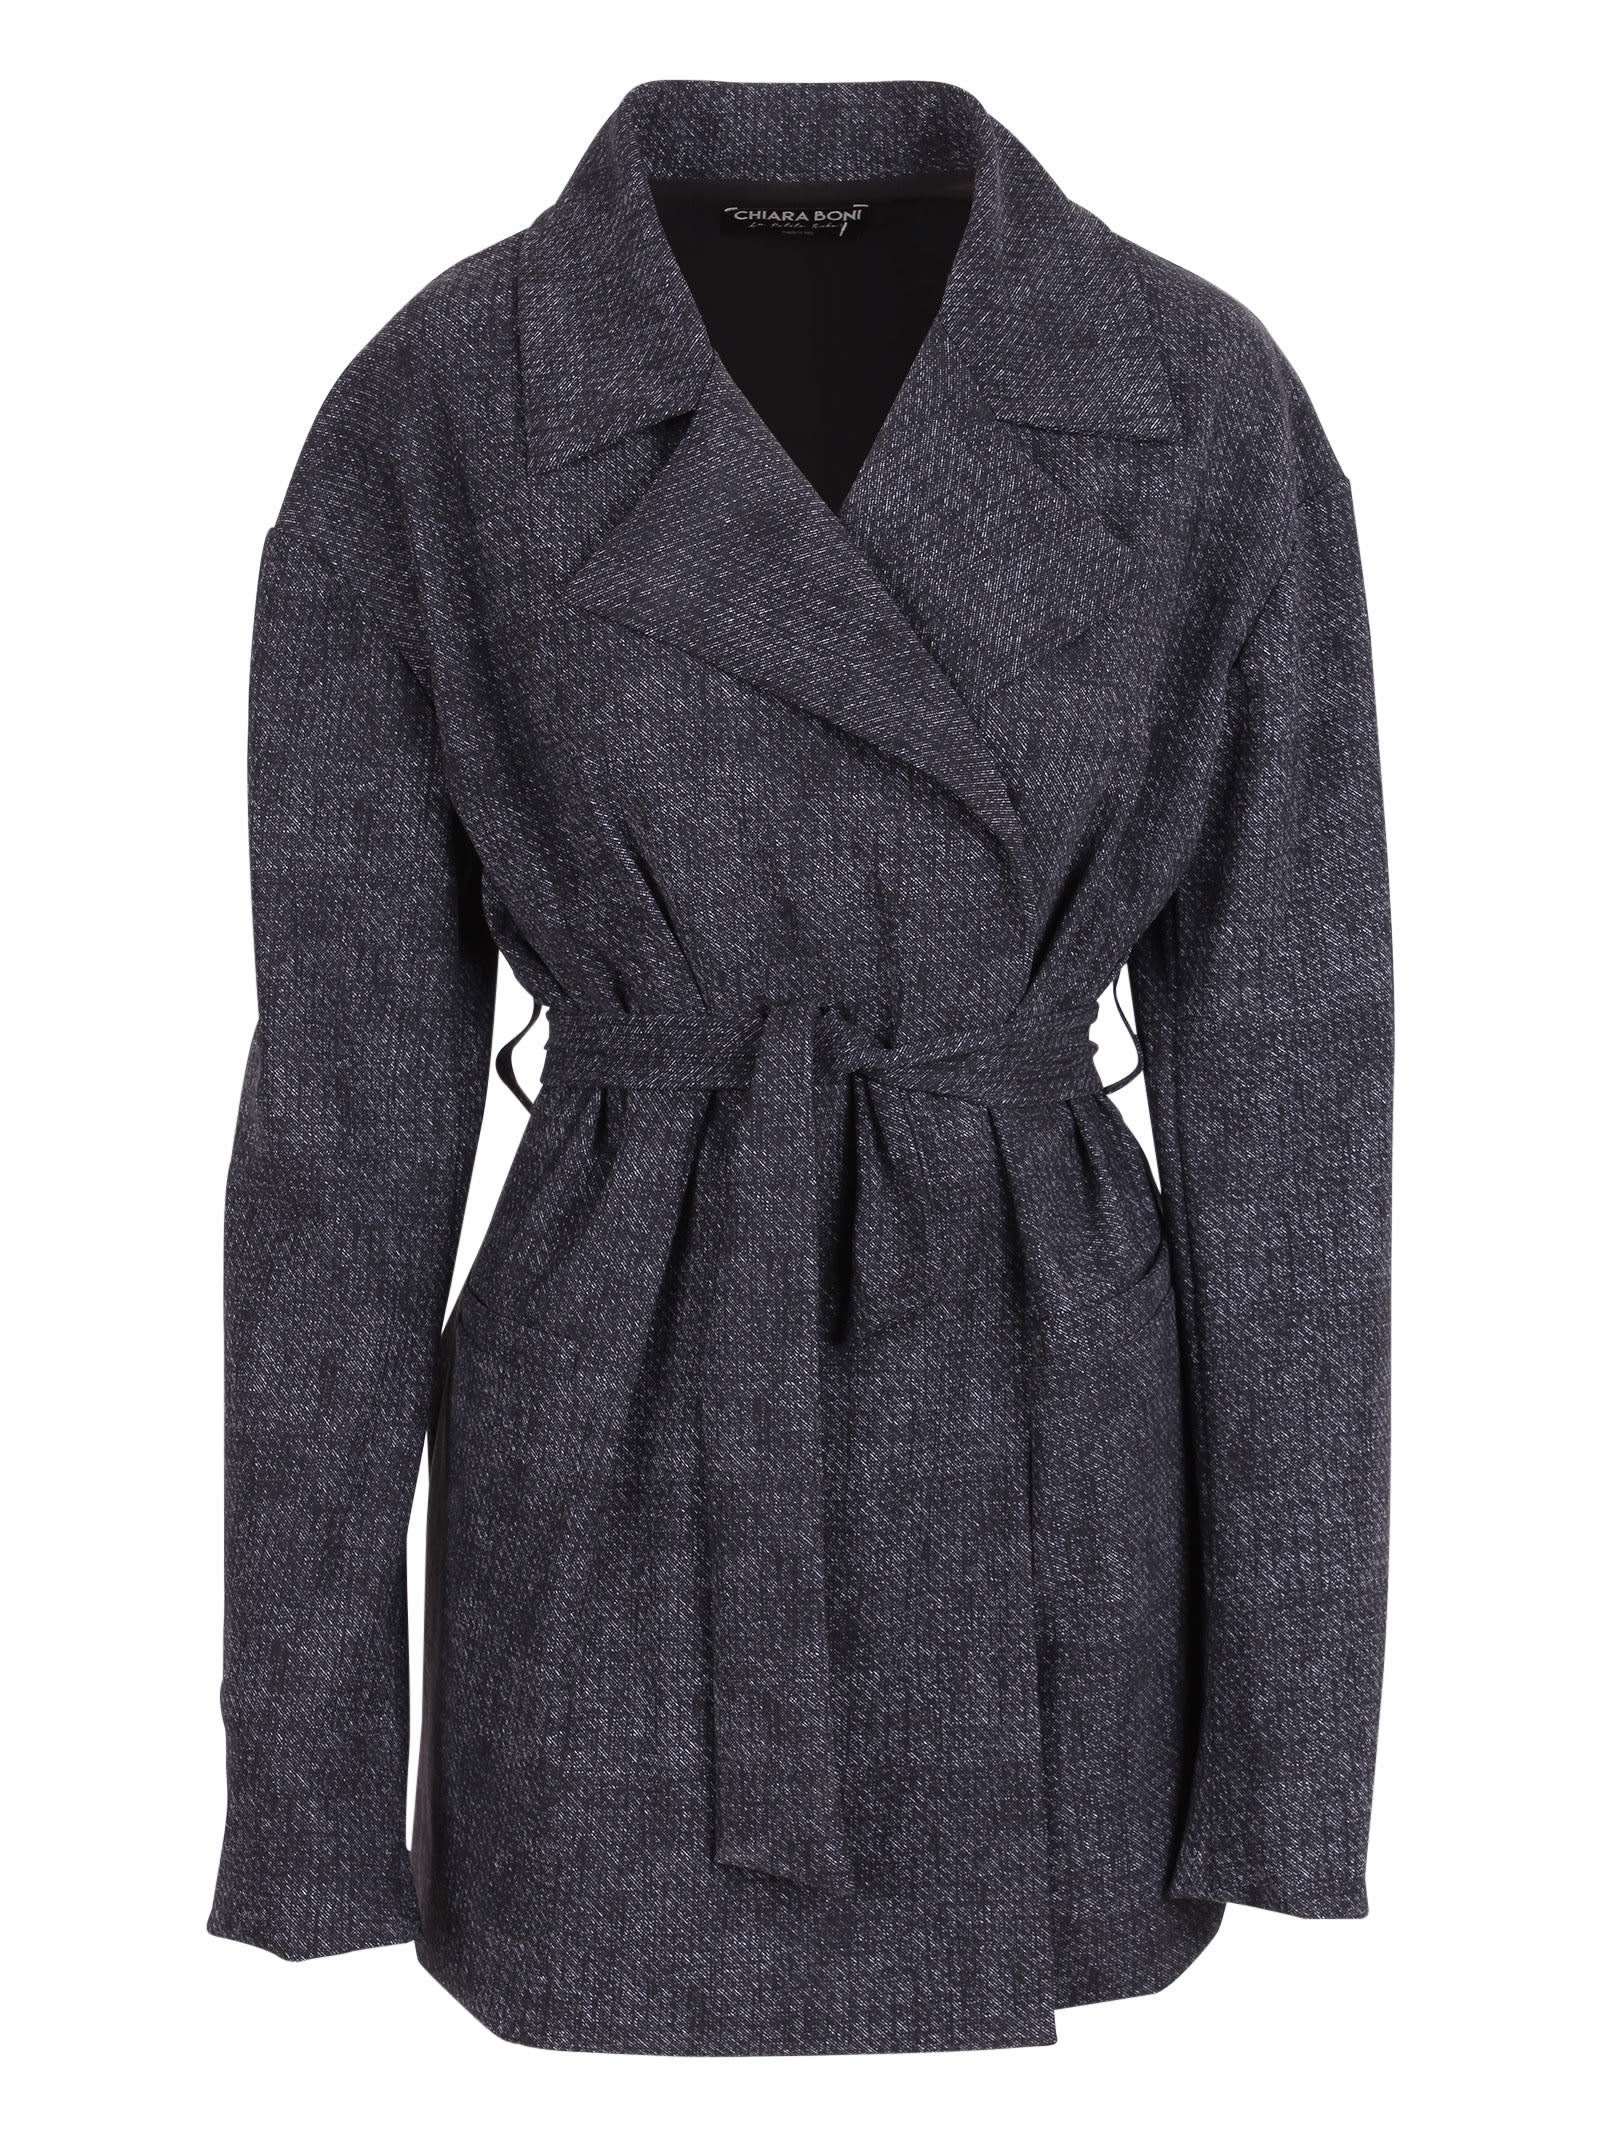 Le Petite Robe Di Chiara Boni glafira Polyamide Jacket